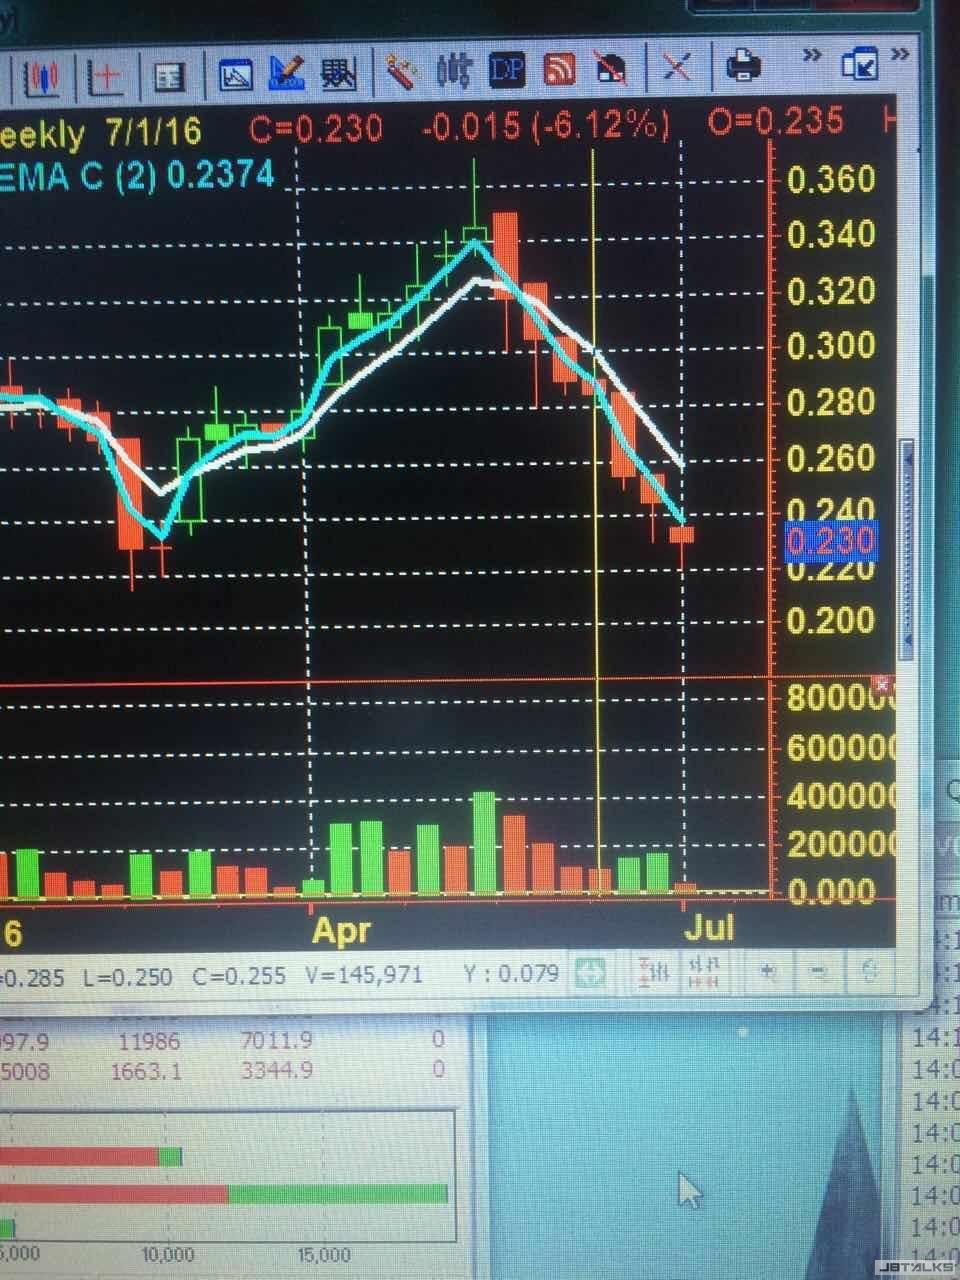 Forum | MalaysiaStock.Biz